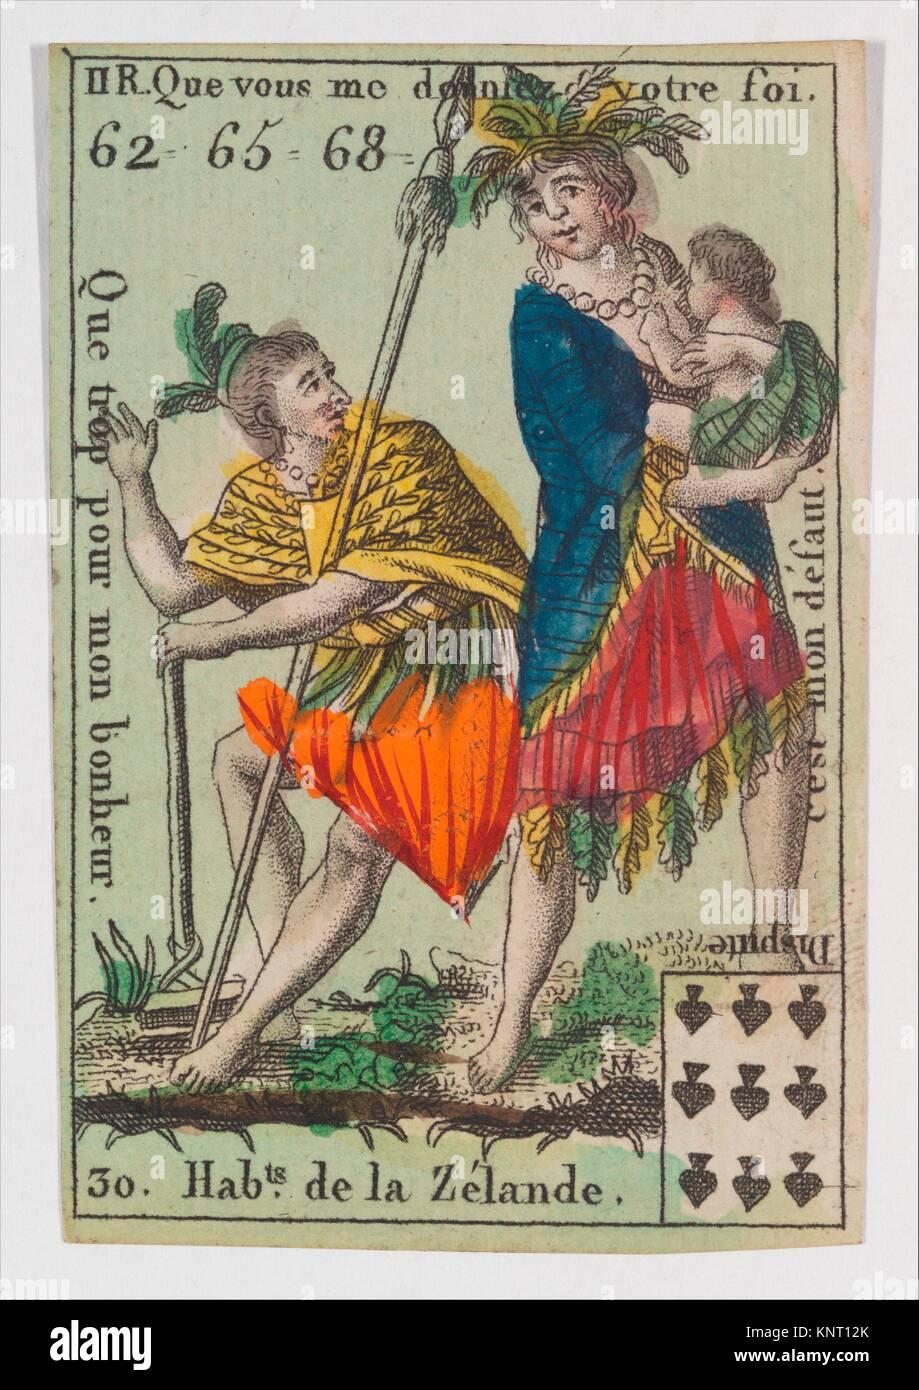 Hab.ts de la Zelande from Playing Cards (for Quartets) ´Costumes des Peuples Étrangers´. Artist: - Stock Image